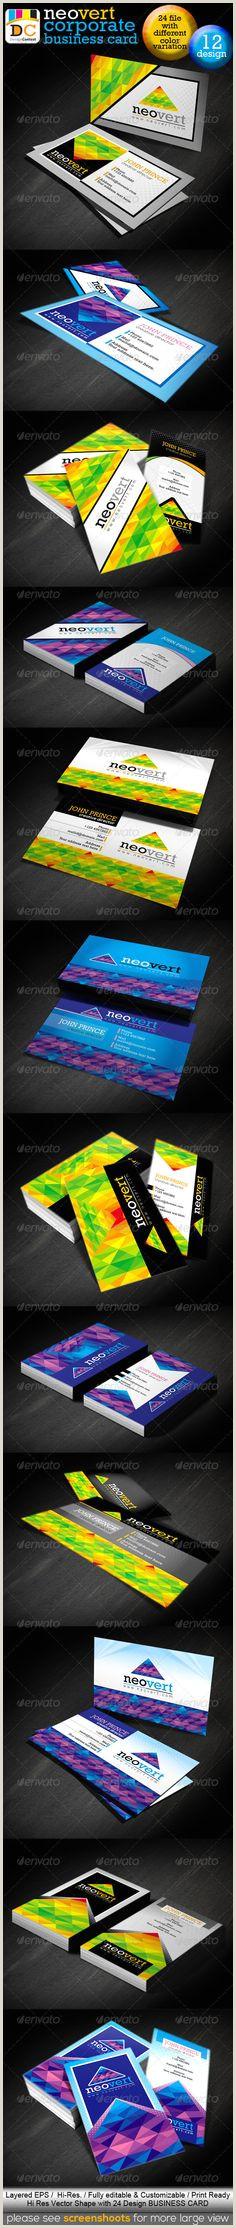 Busines Card Design 80 Business Card Ideas Ideas